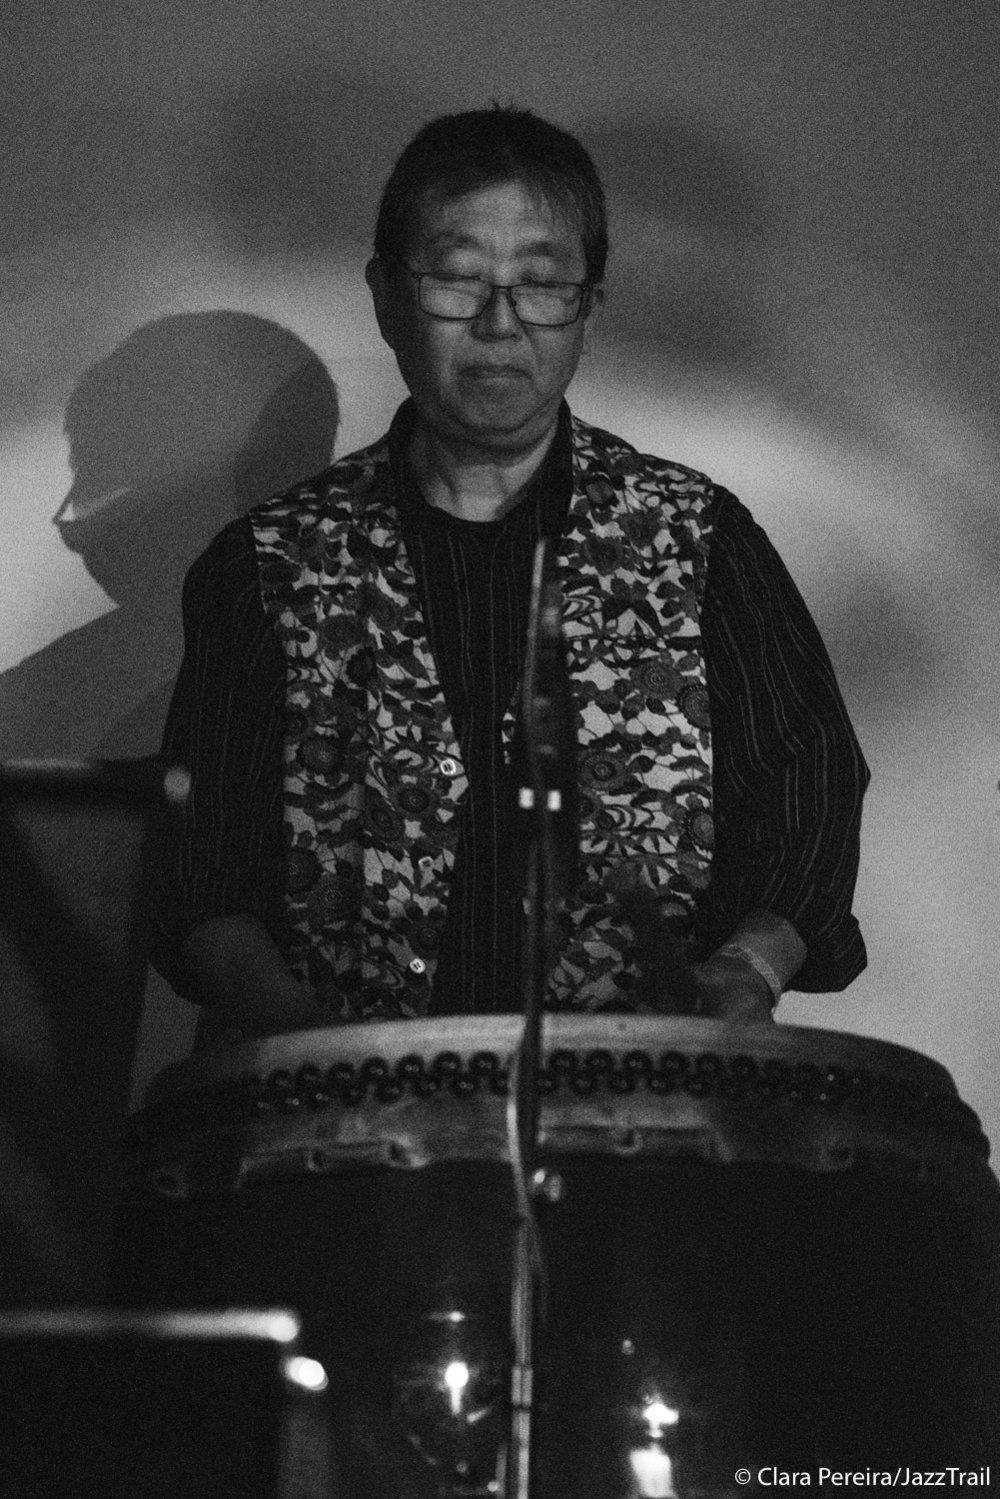 Tatsu Aoki, 2018